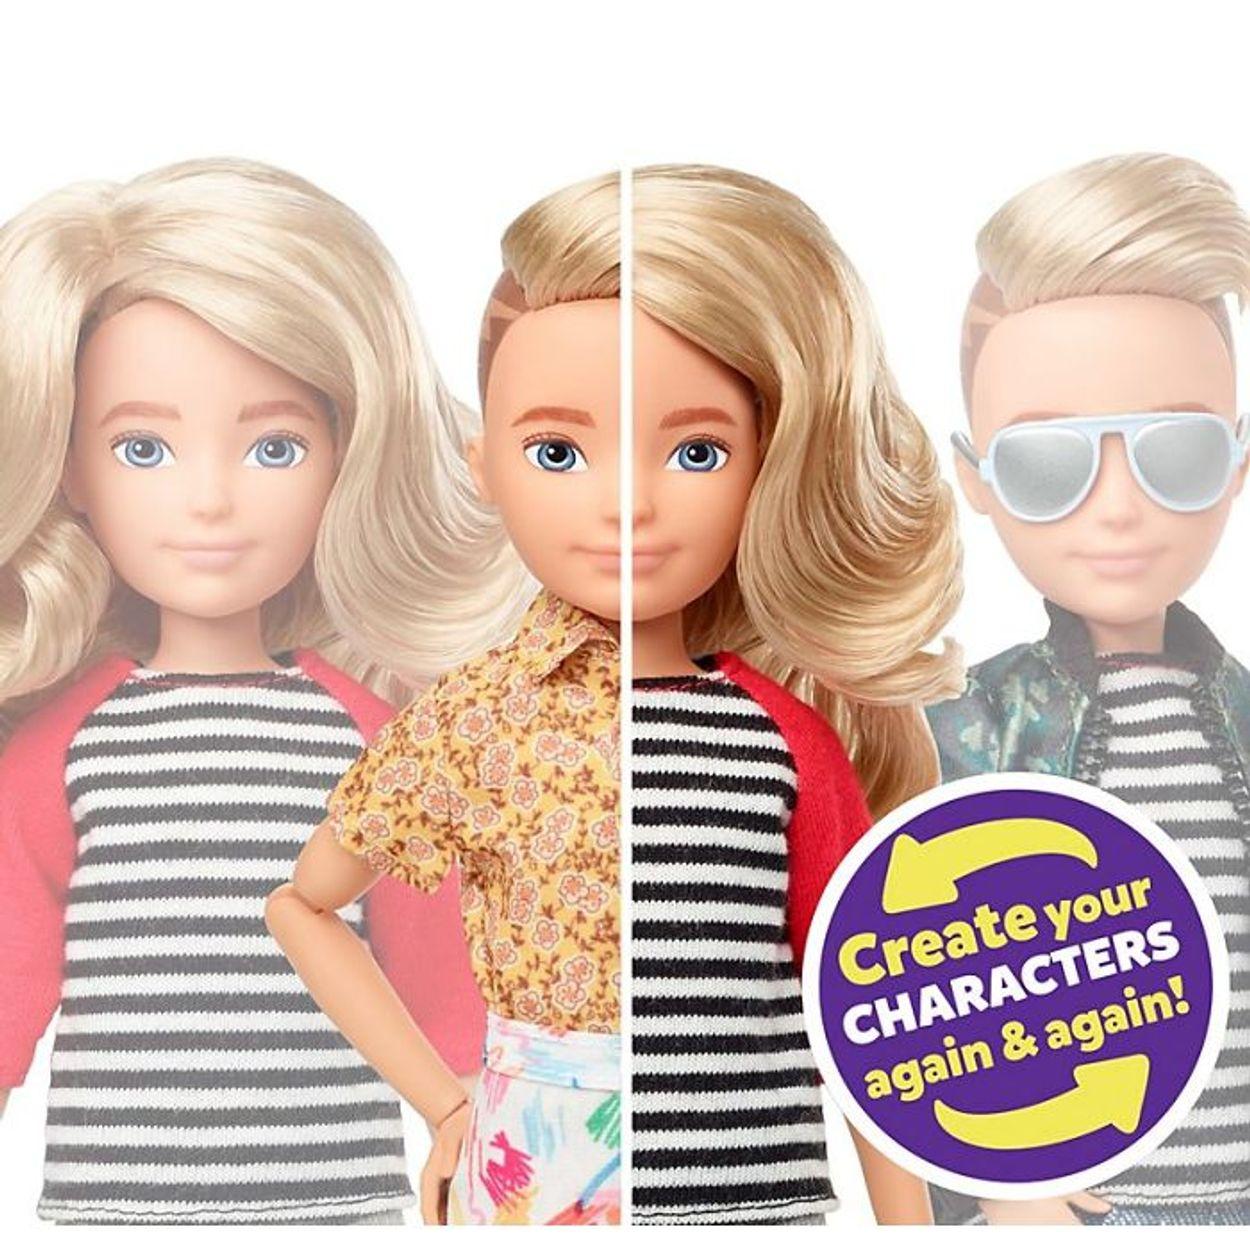 1A1 5d8c69bc7e09f-gender-neutral-dolls-toy-company-mattel-1-10-5d8b350c8b882__700